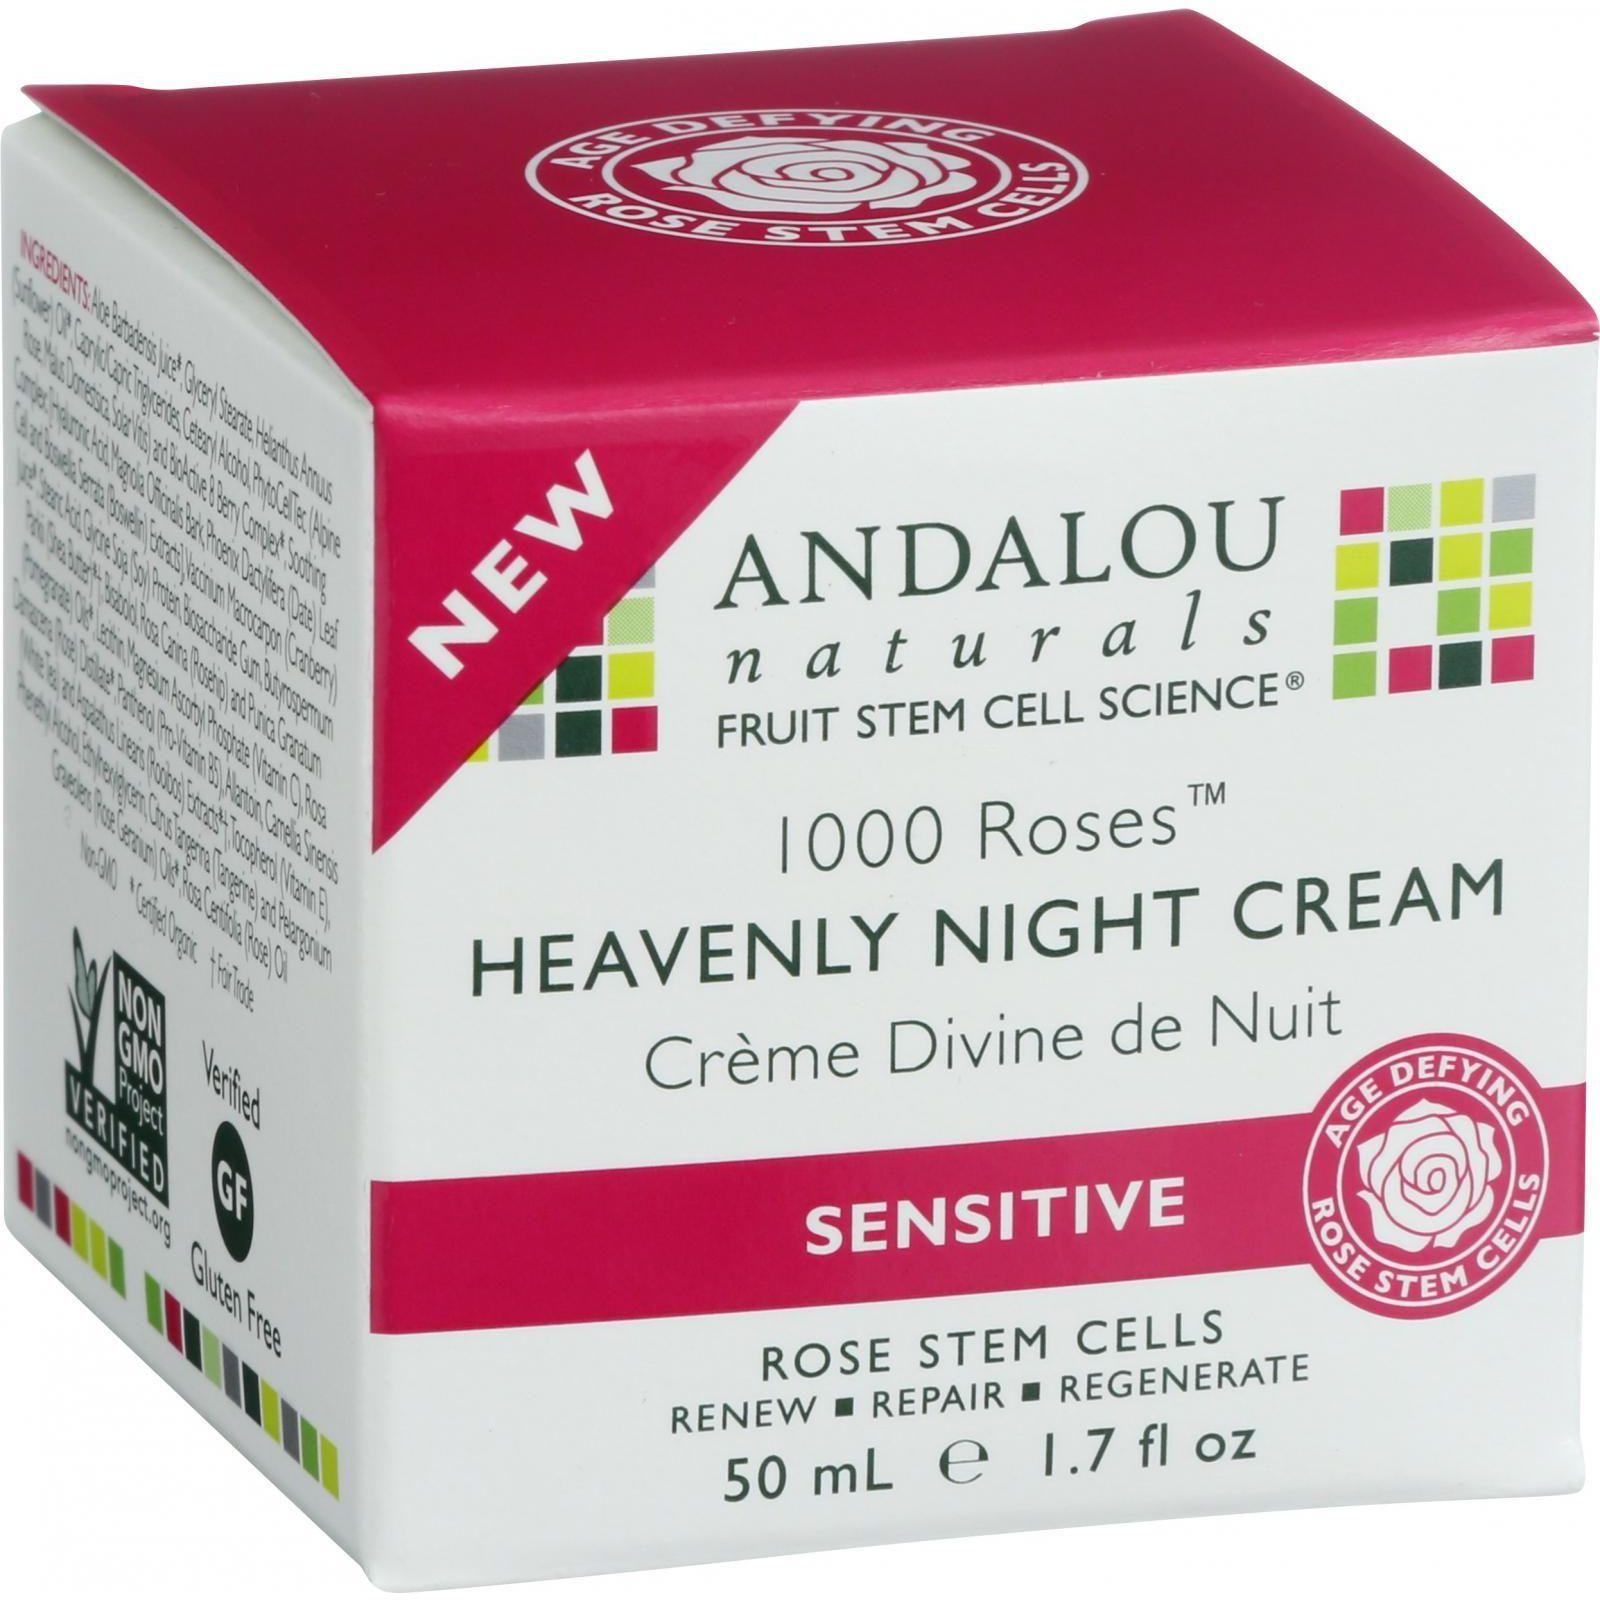 Andalou Naturals Heavenly Night Cream  1000 Roses  1.7 oz